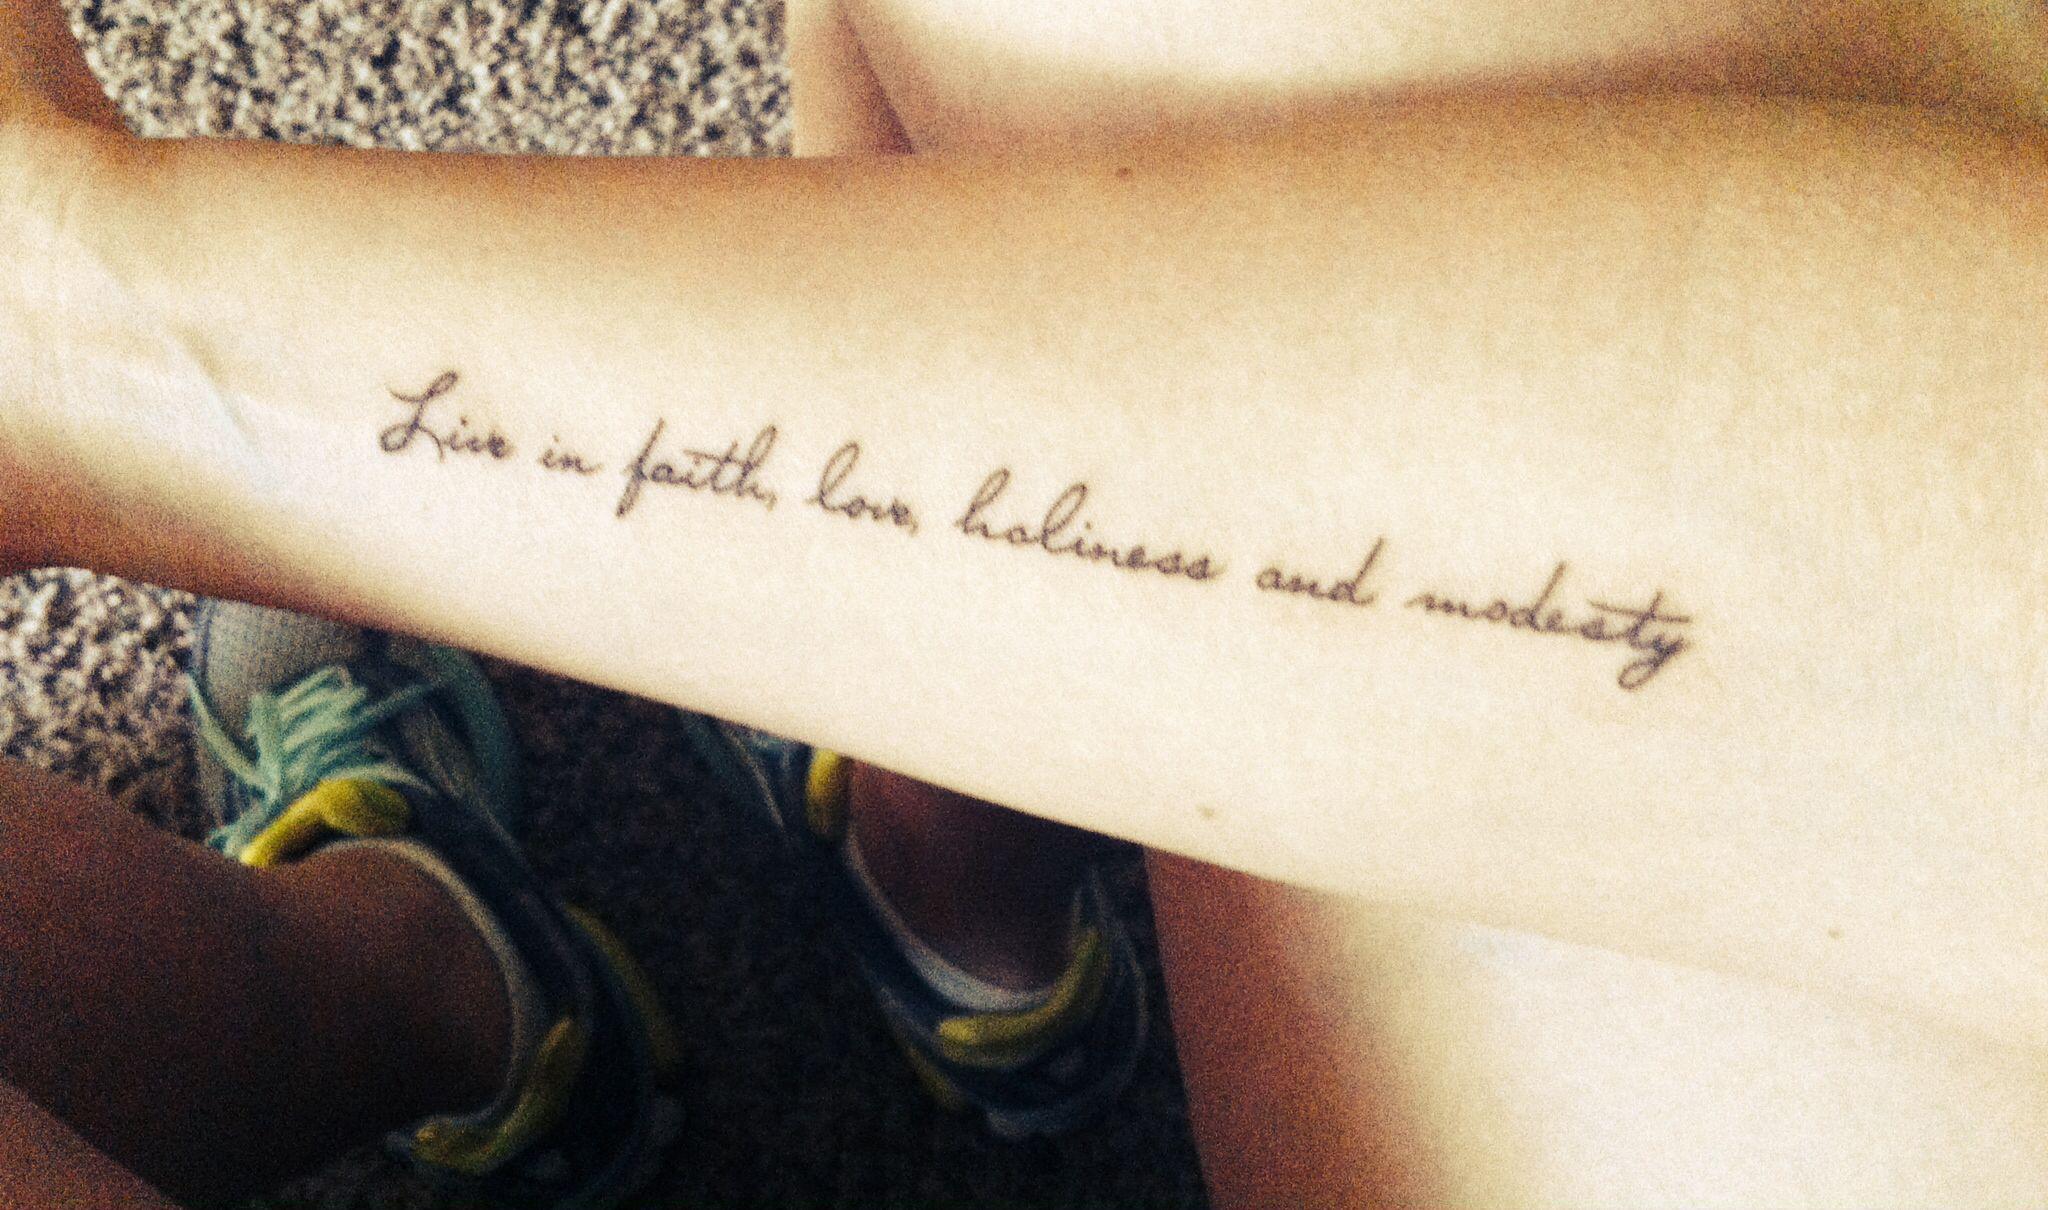 Small Religious Tattoo: Small Feminine Christian Tattoo Live In Faith, Love